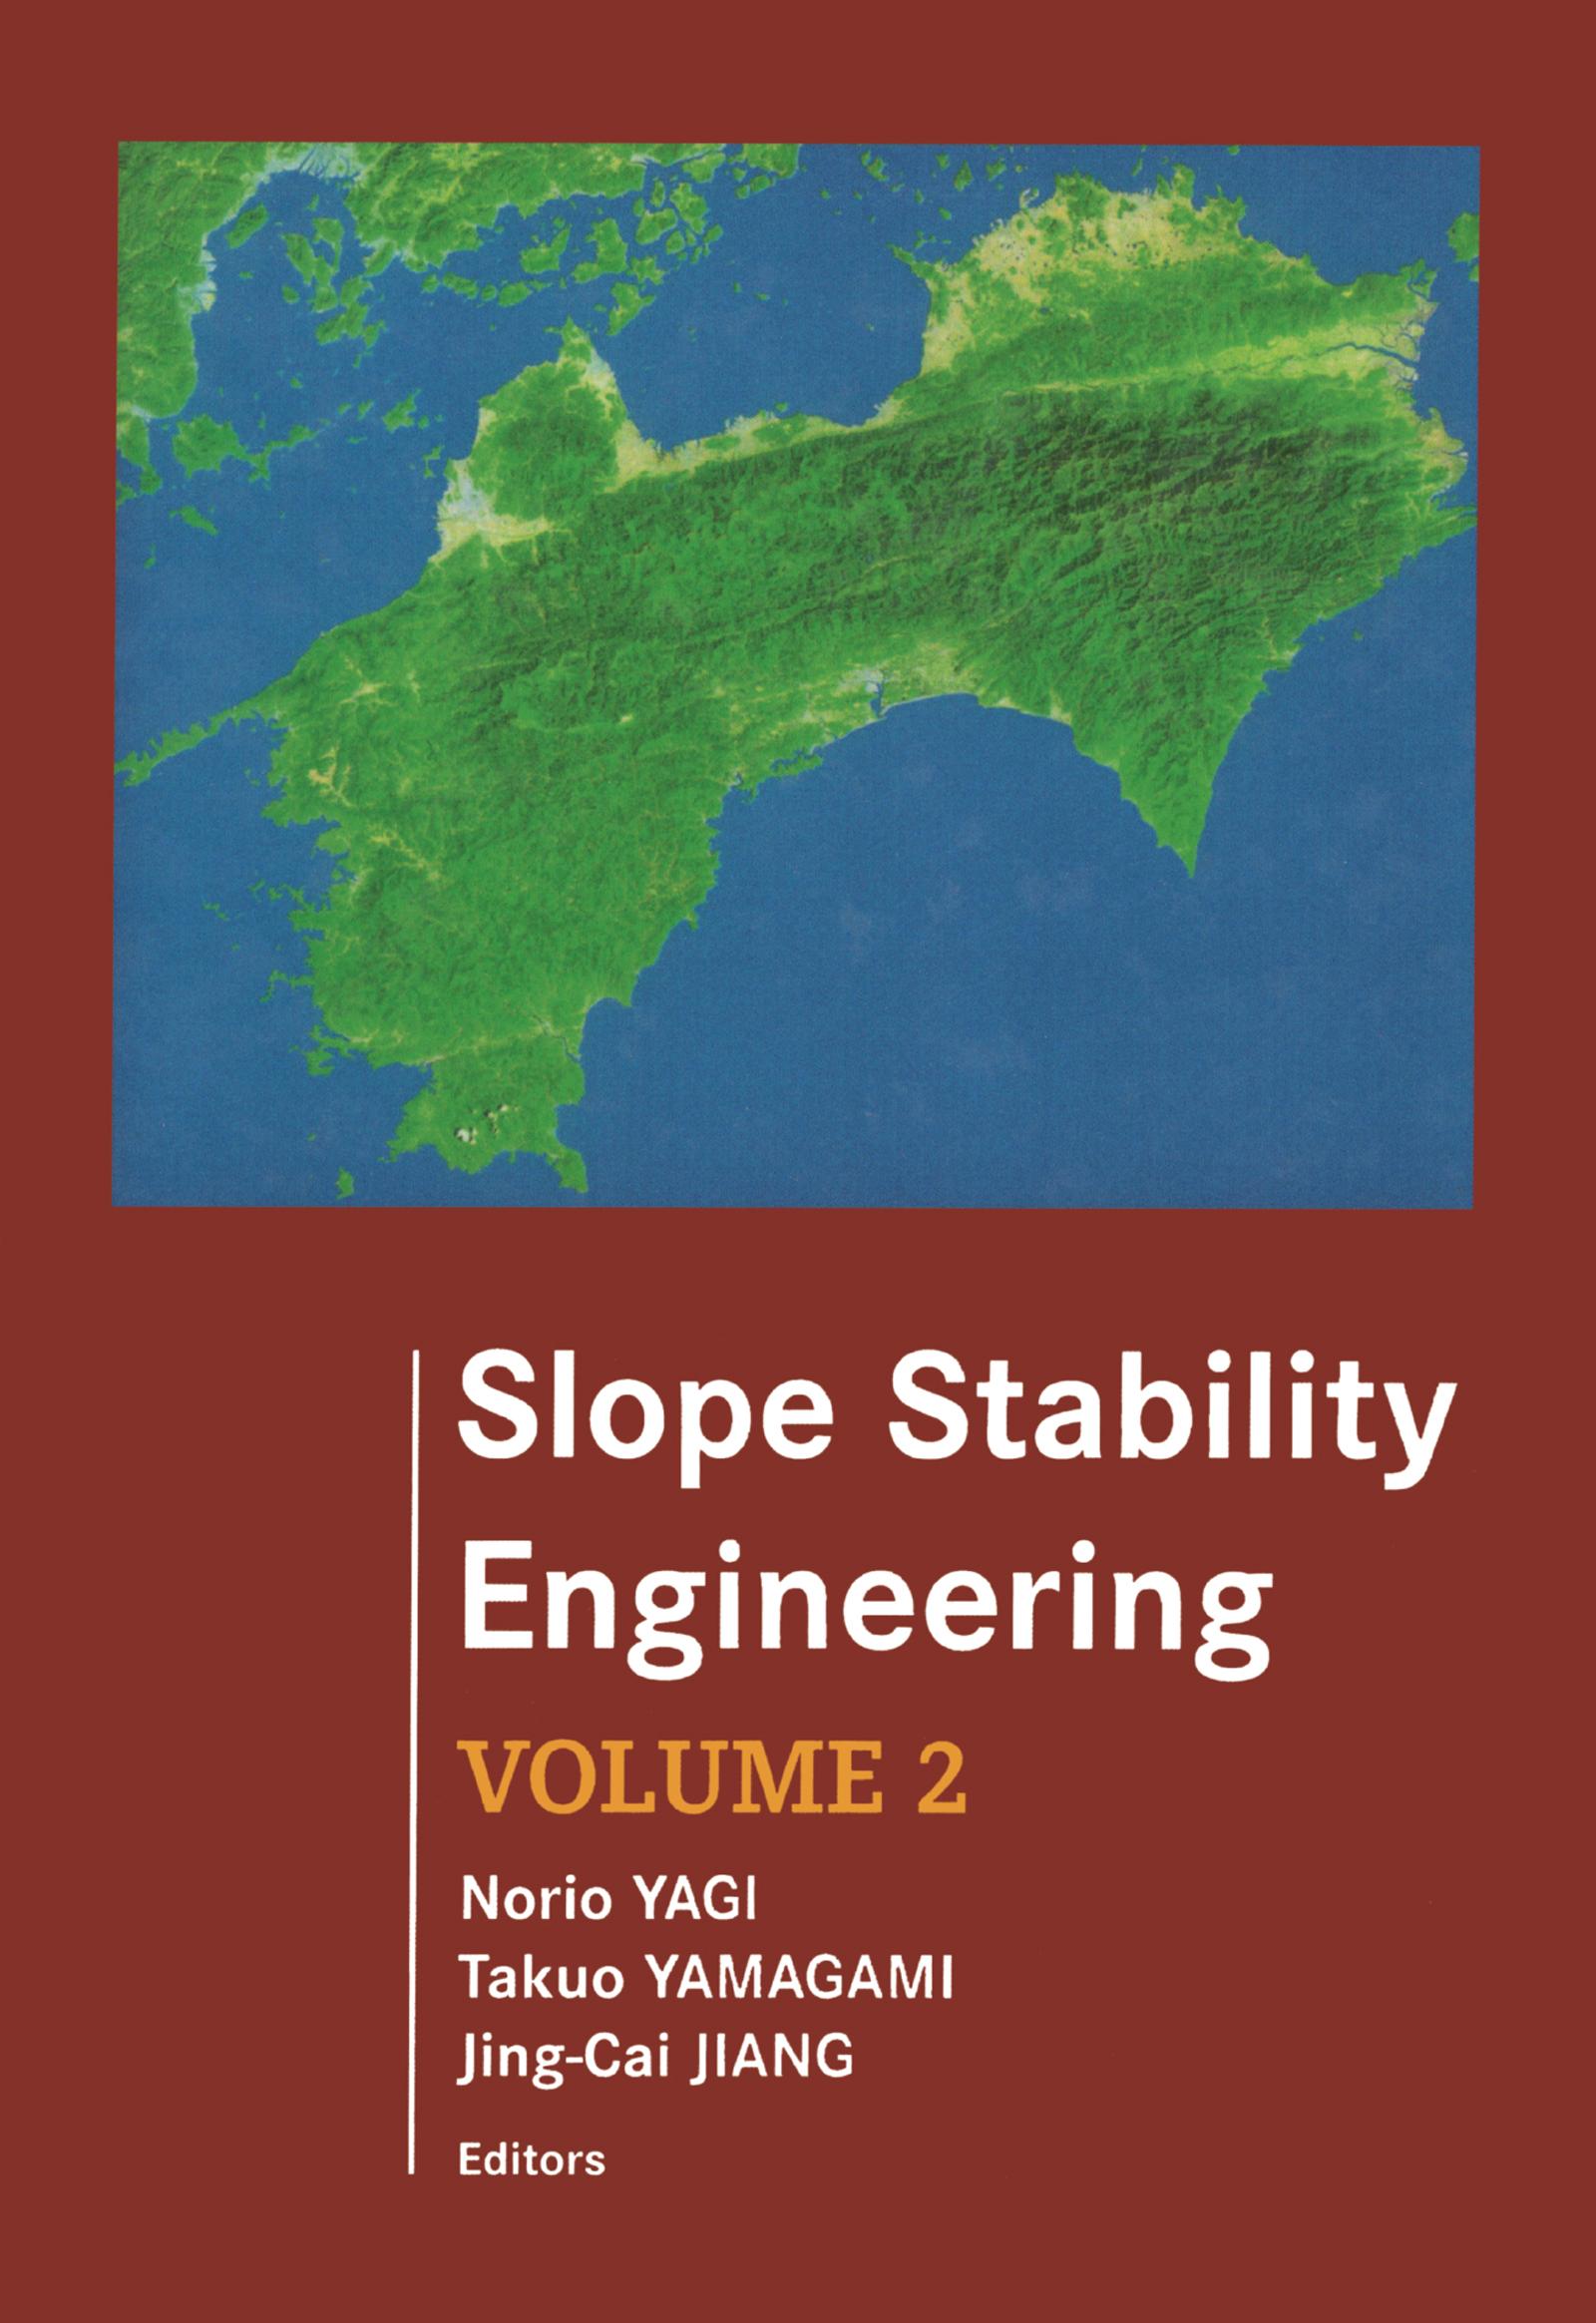 Effect of soil slope gradient on motion of rockfall